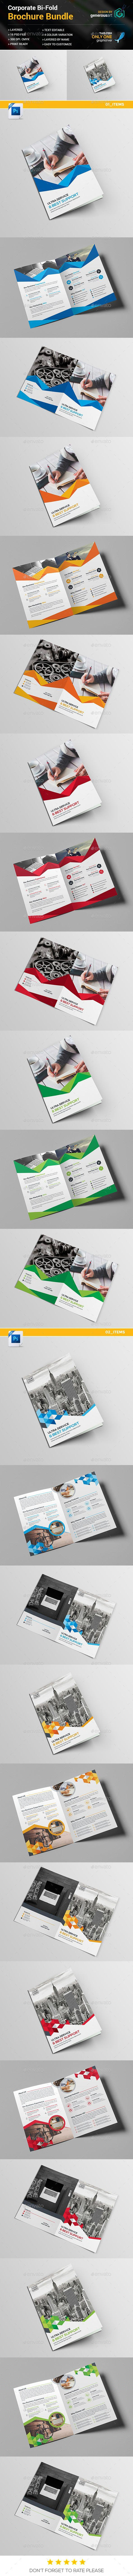 2 Bi Fold Brochure Templates Psd Download Here Https